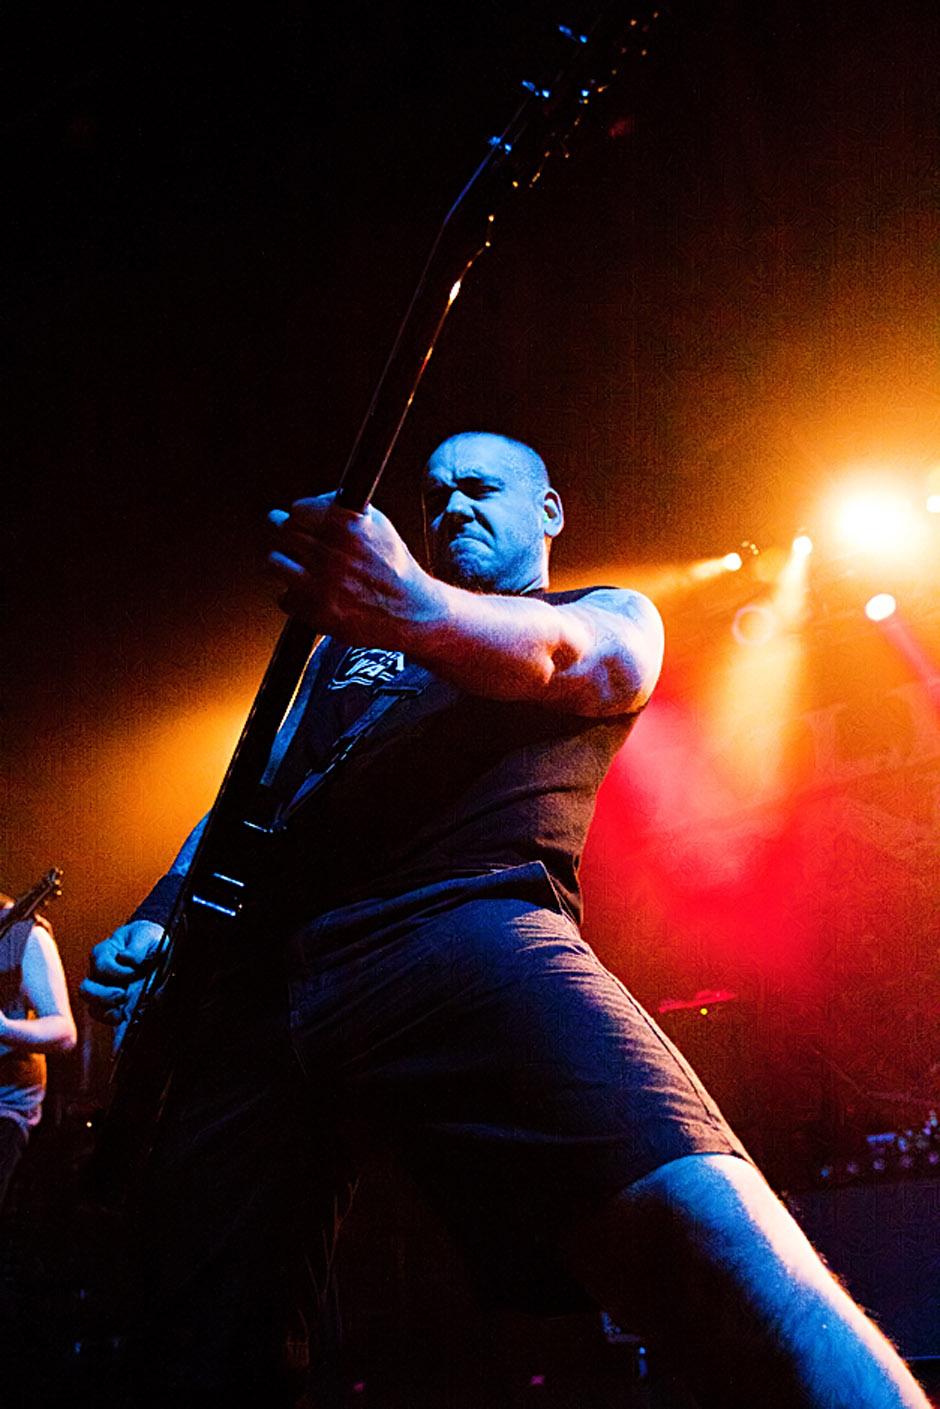 Killswitch Engage live, 09.04.2013, Stuttgart